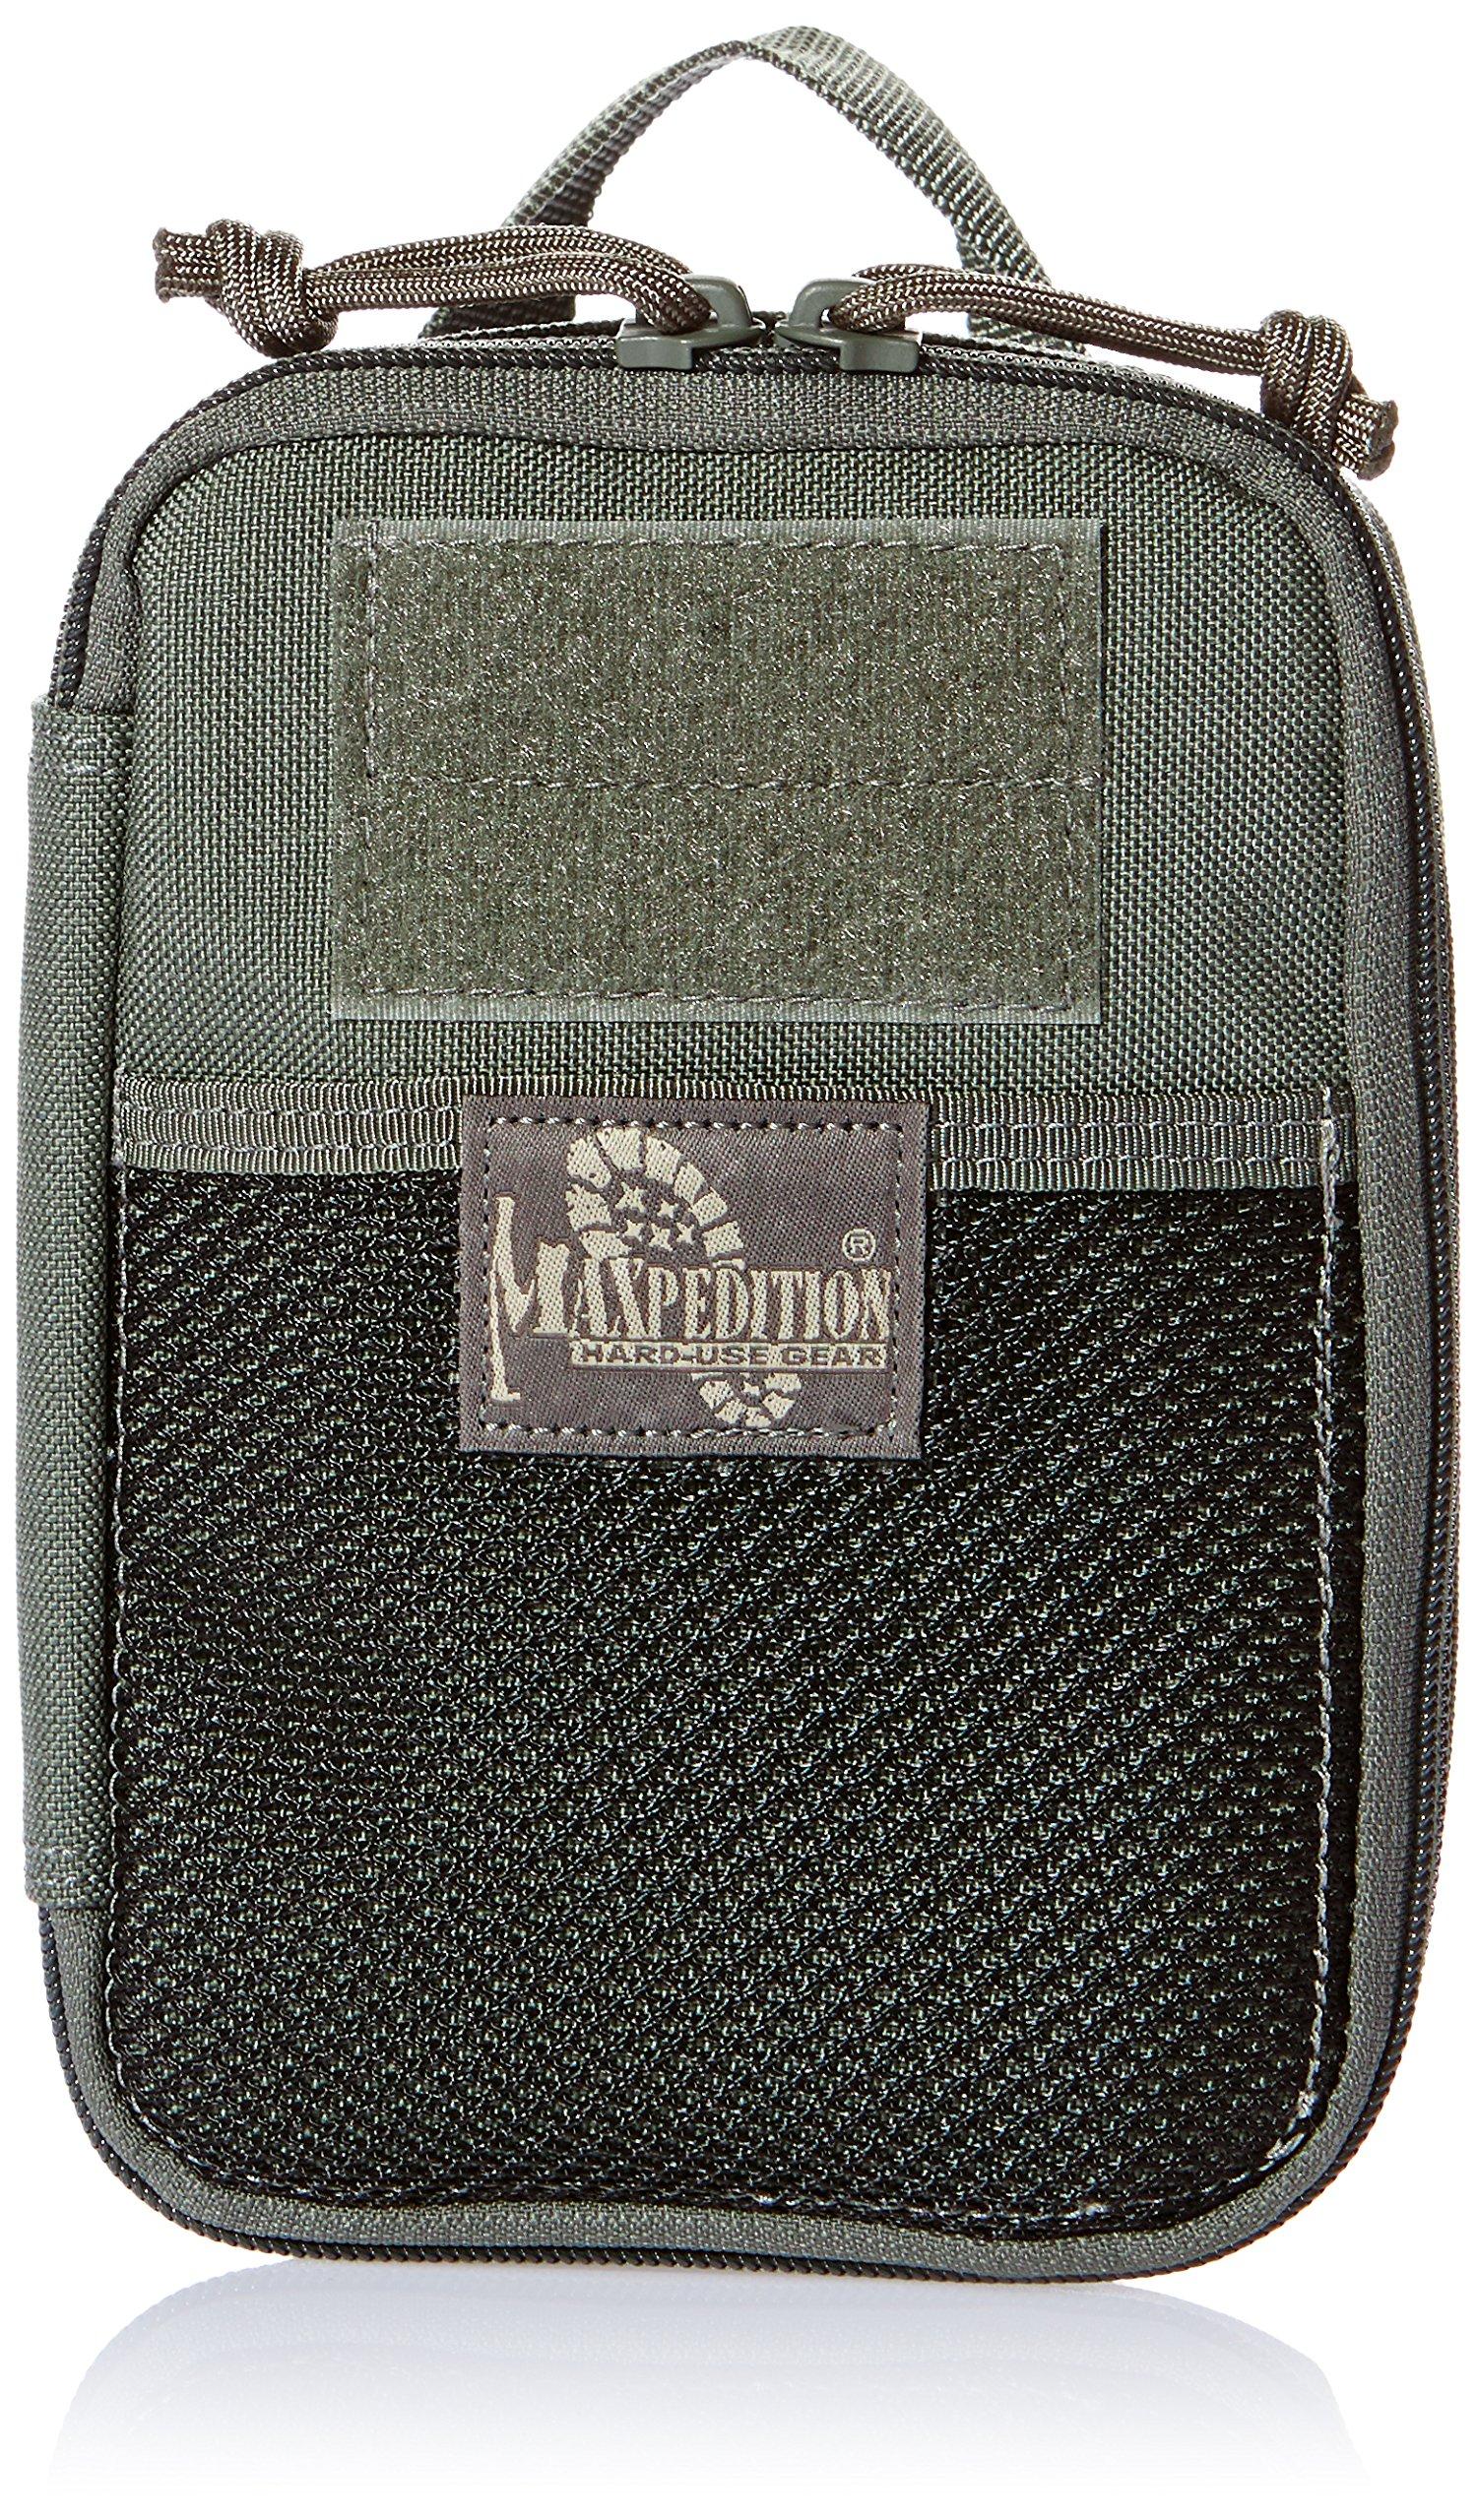 Maxpedition Medium Fatty Pocket Organizer (Foliage Green)